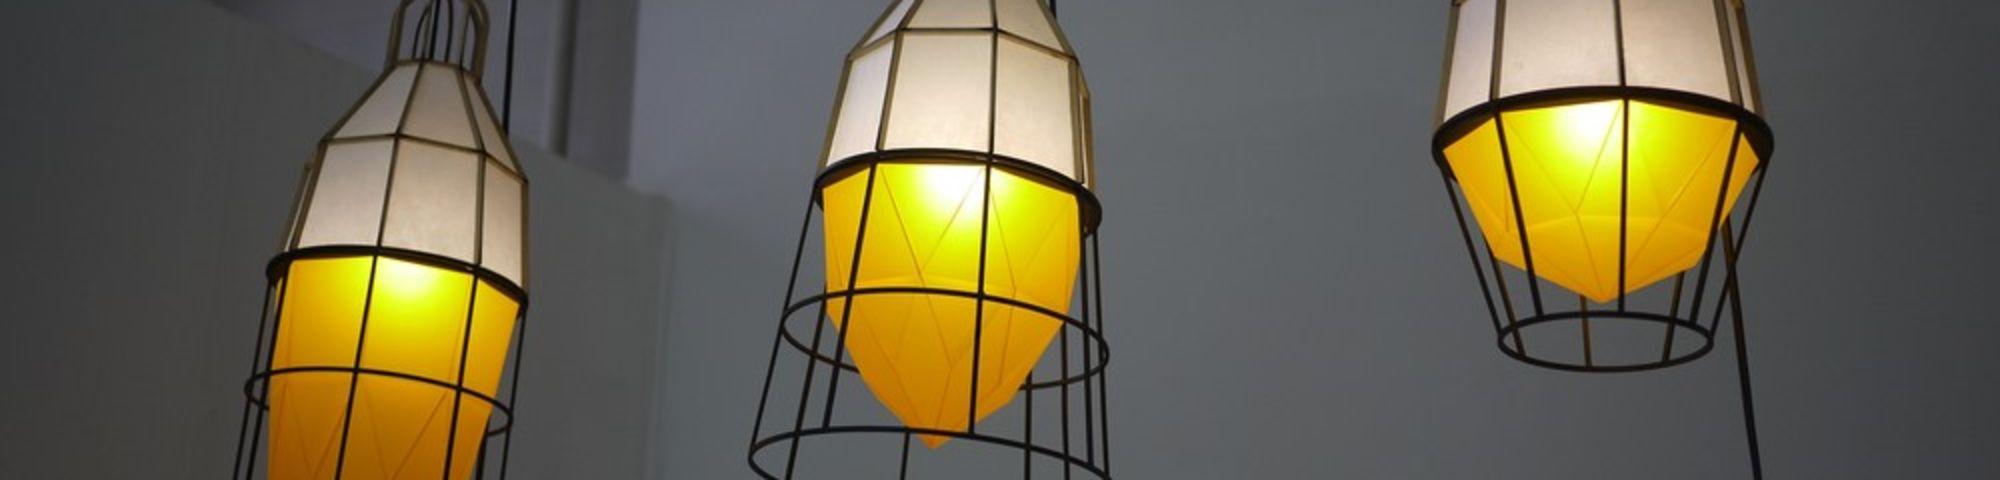 Swell Interior Lighting Design Online Ual Home Interior And Landscaping Dextoversignezvosmurscom